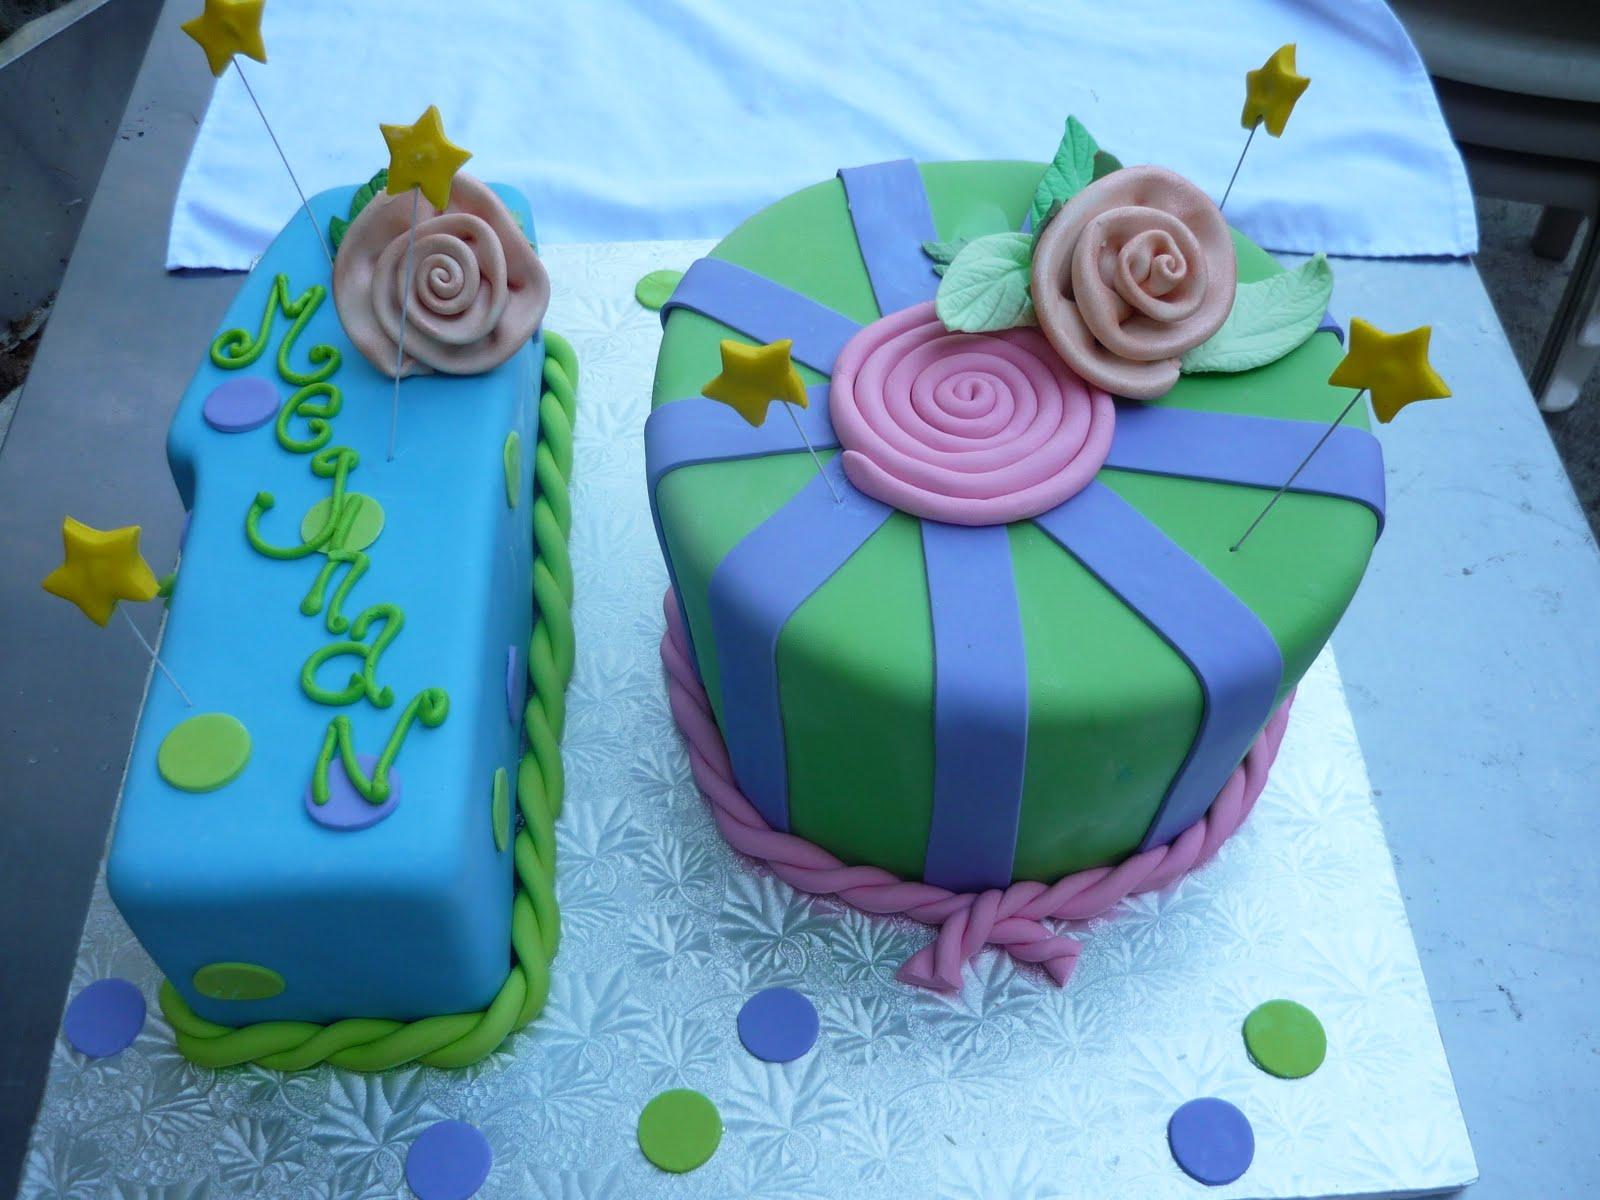 Artisan Bake Shop August 2010